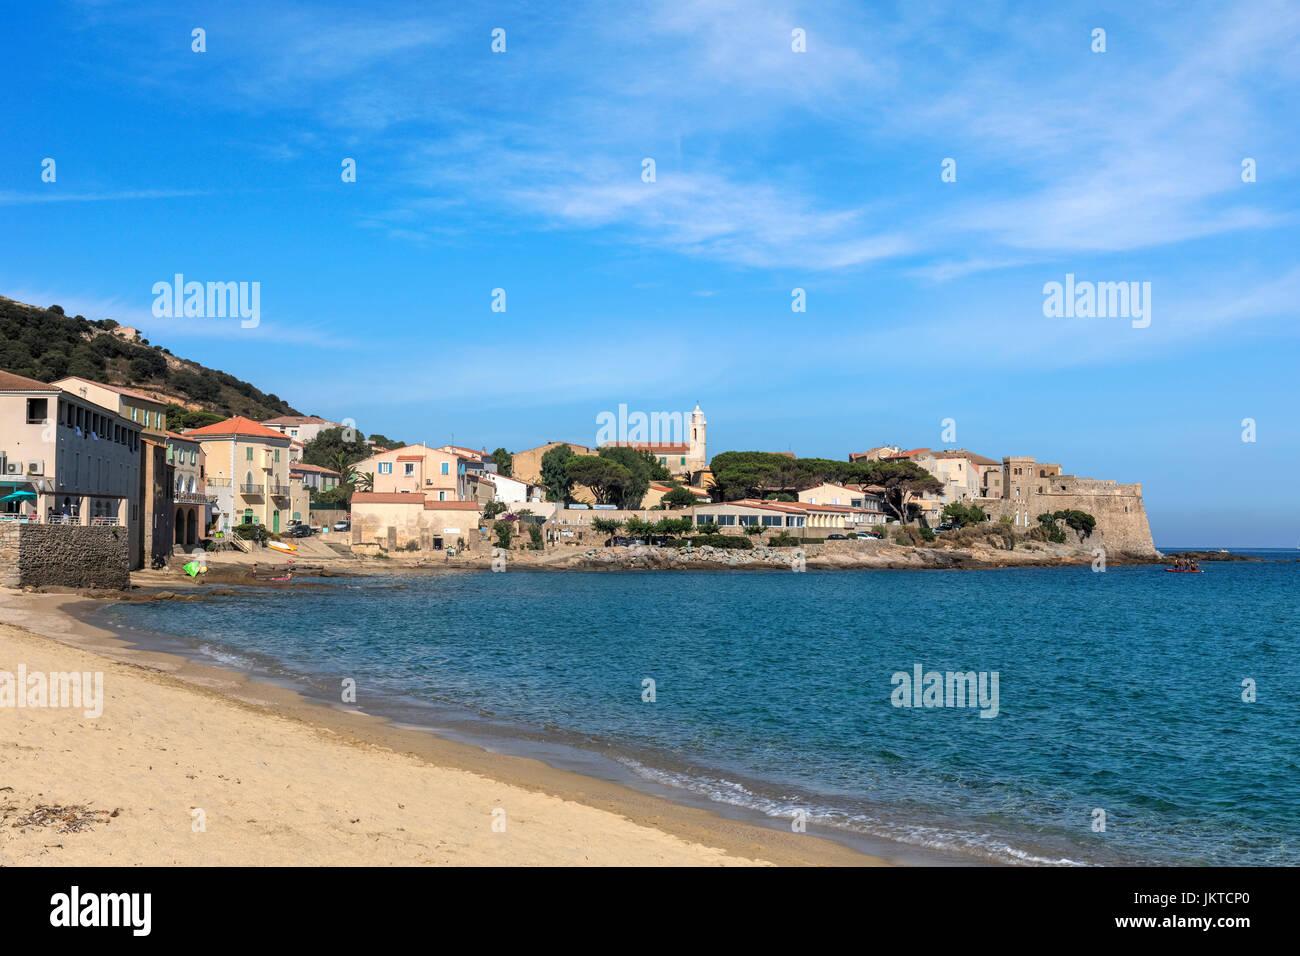 Algajola, Corsica, Balagne, France - Stock Image